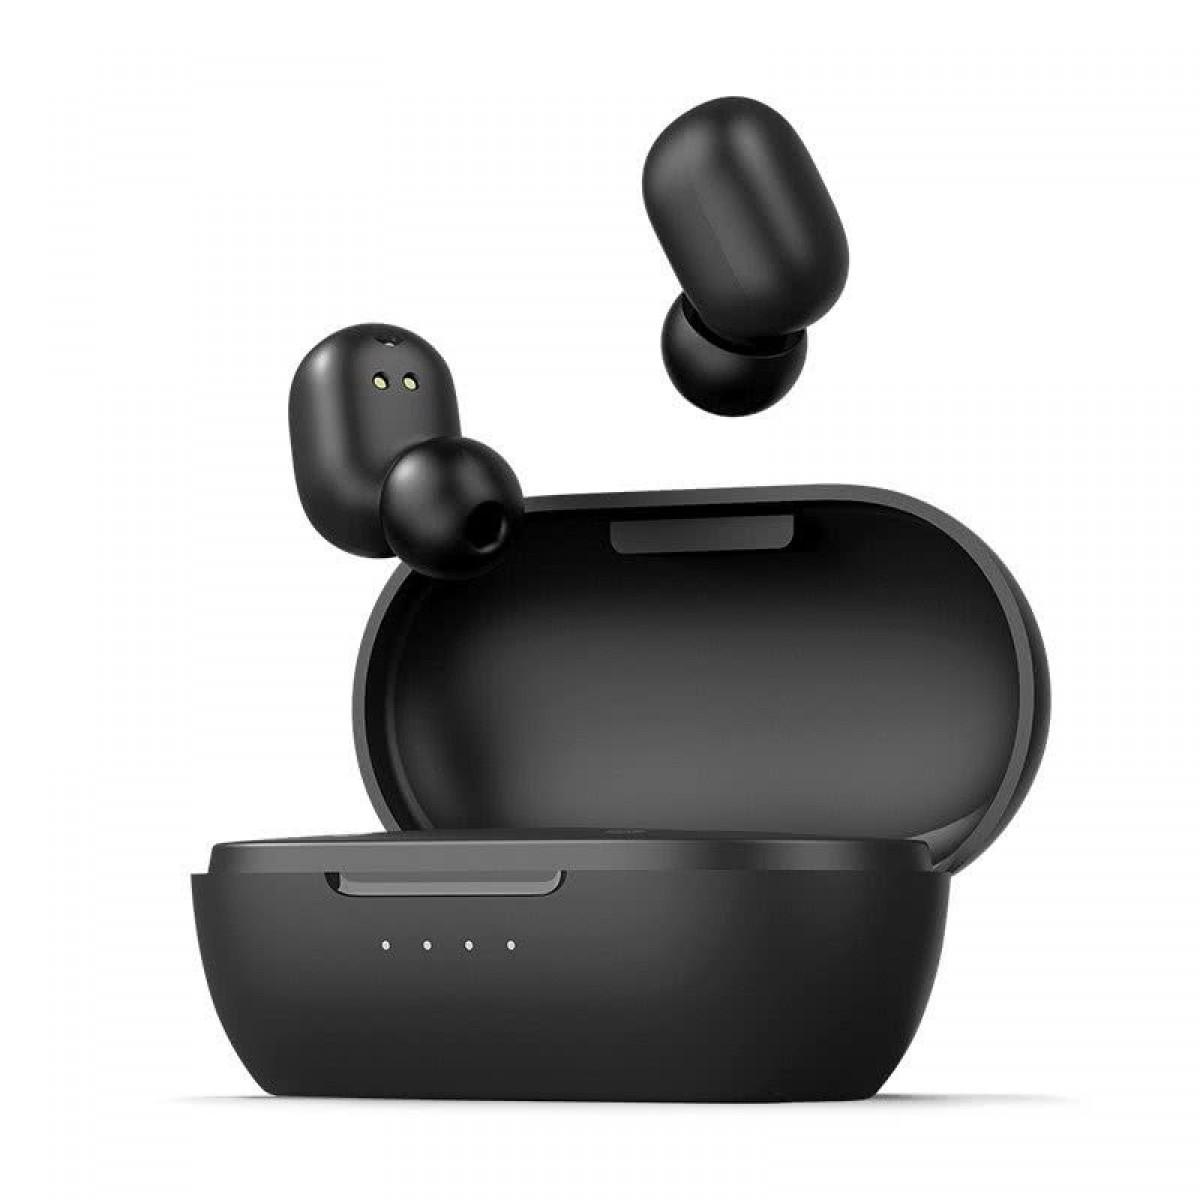 Fone de Ouvido Bluetooth Xiaomi HAYLOU GT1 XR, Black